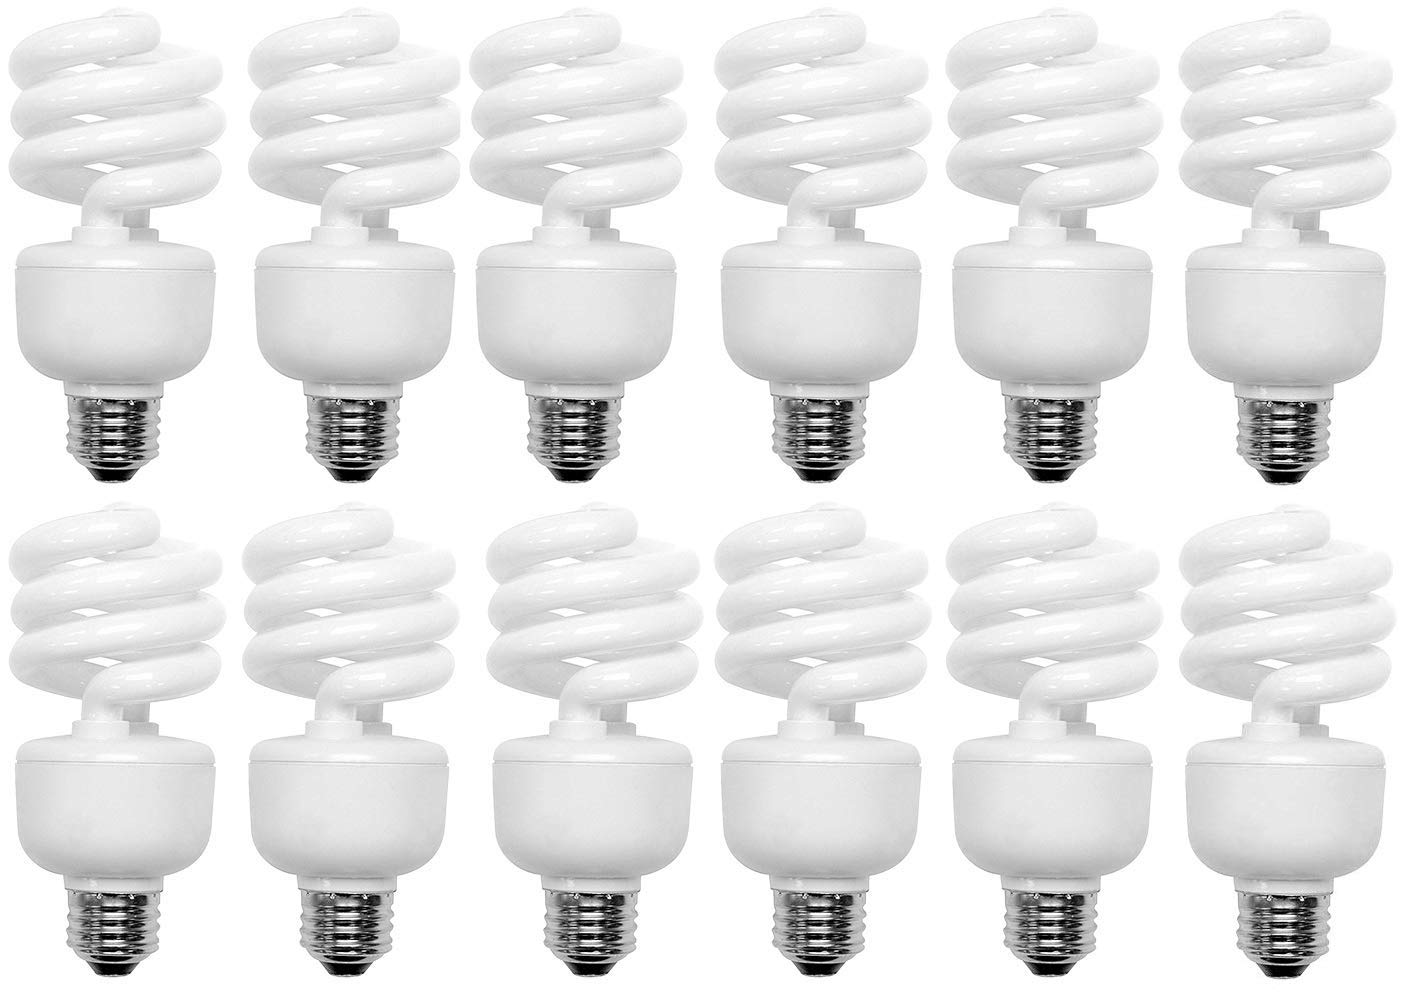 100 Watt CFL Spiral, 12 Pack, Soft White (2700K) Light Bulbs